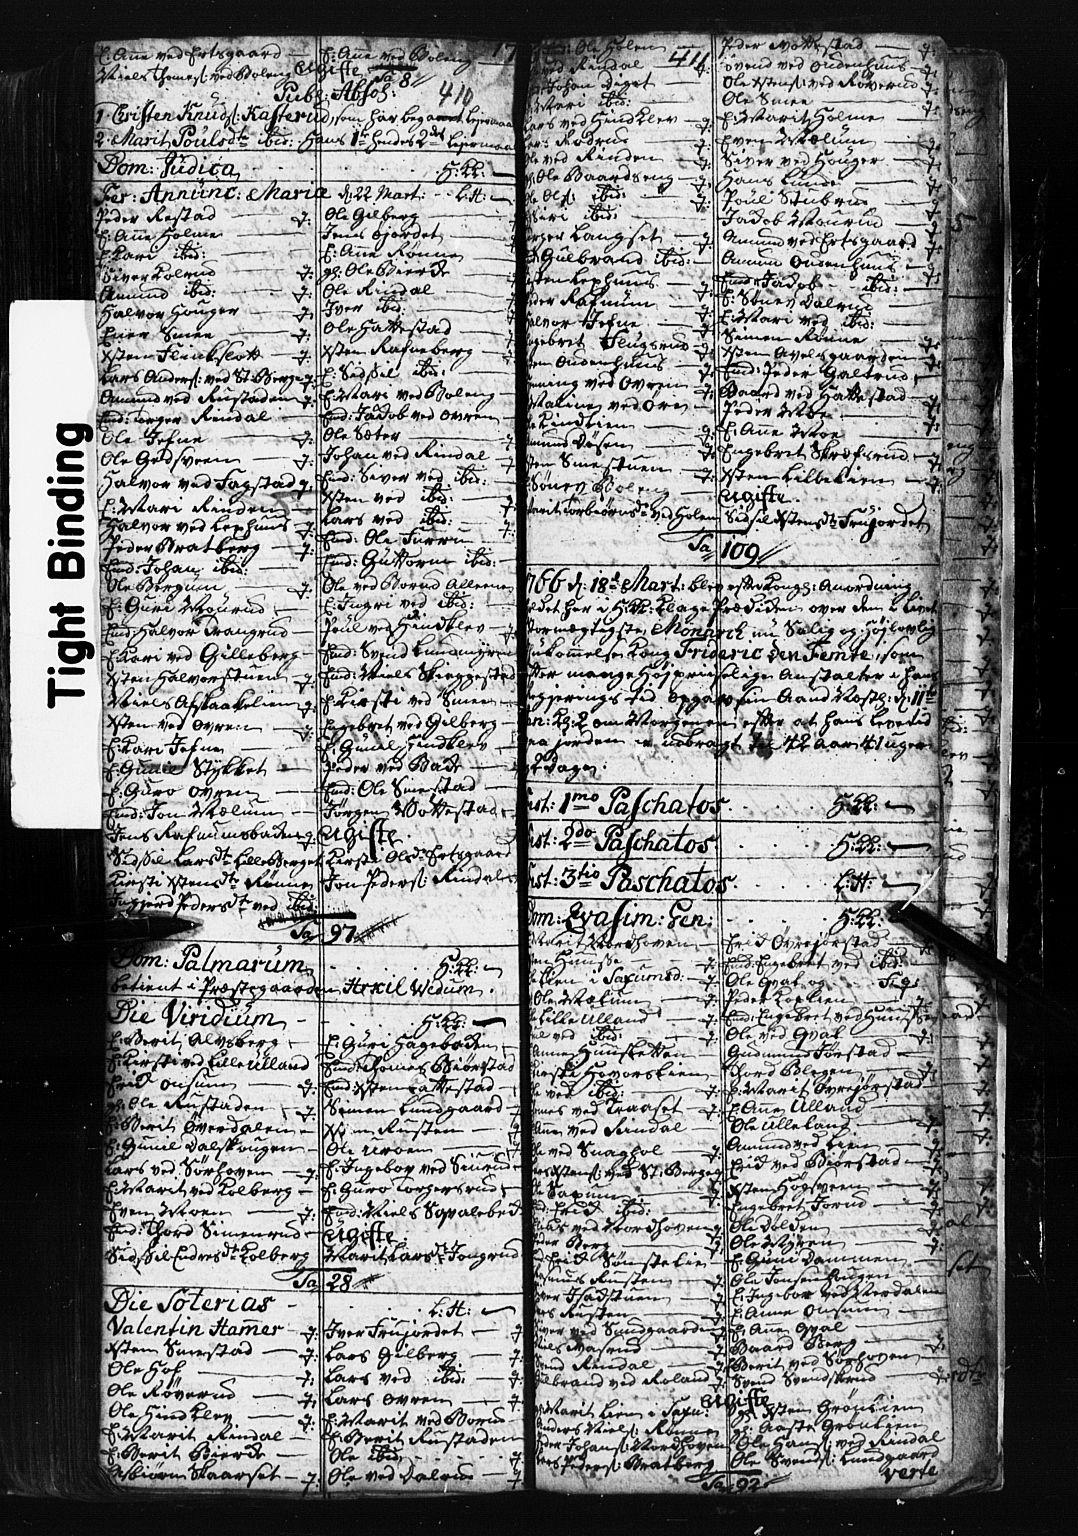 SAH, Fåberg prestekontor, Klokkerbok nr. 1, 1727-1767, s. 410-411